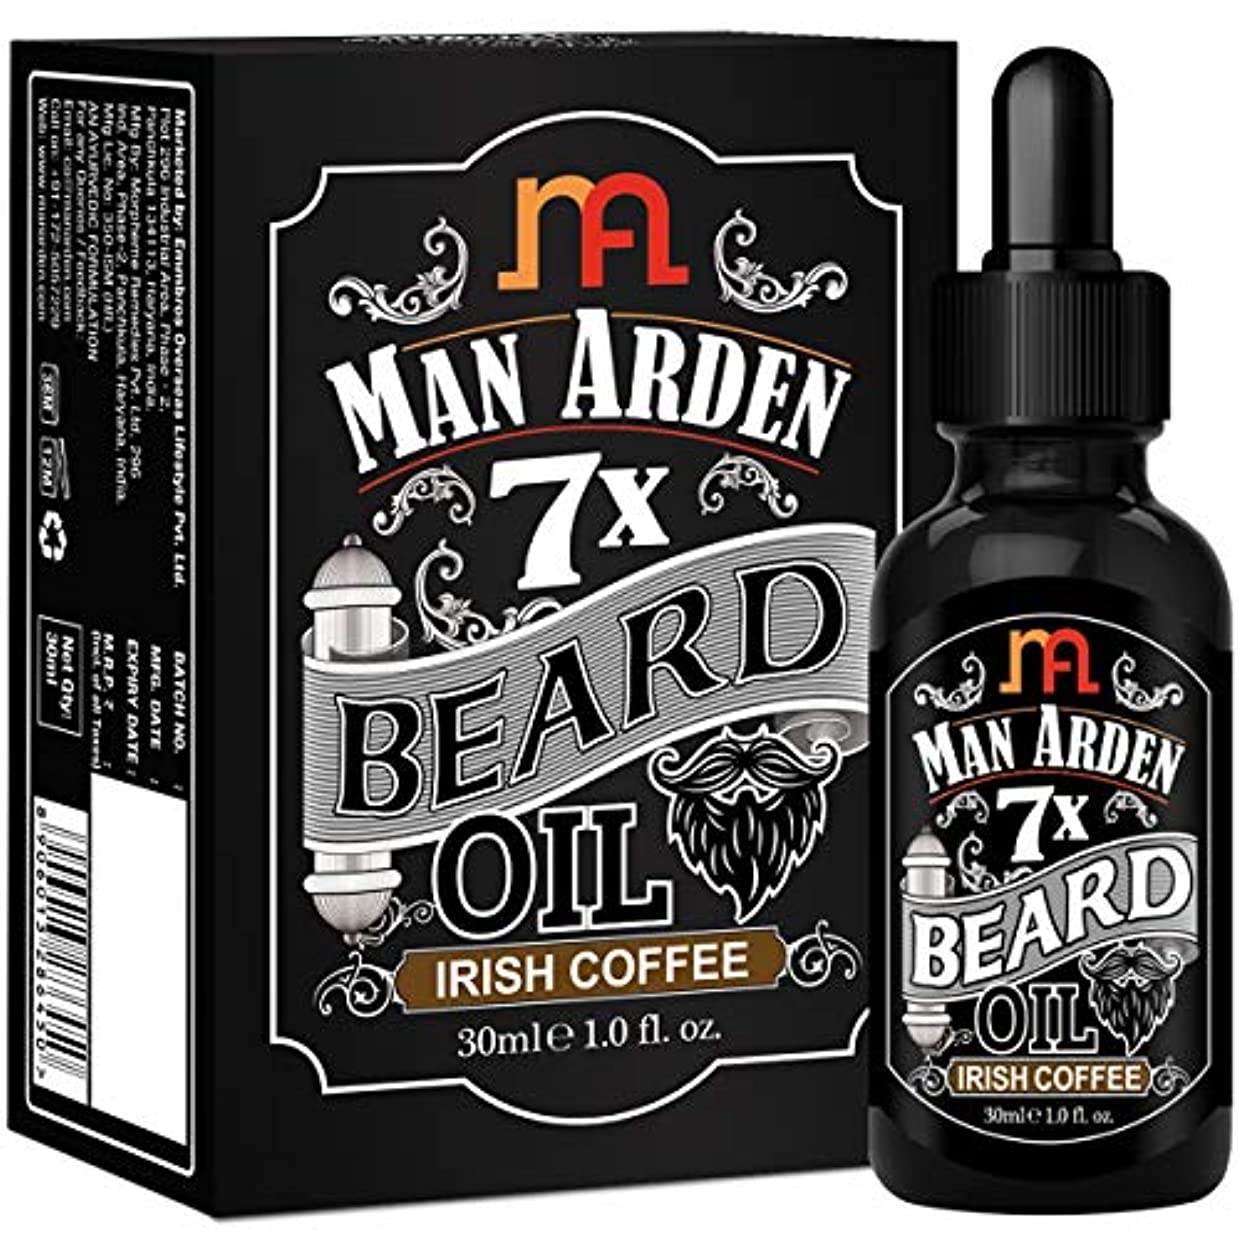 Man Arden 7X Beard Oil 30ml (Irish Coffee) - 7 Premium Oils For Beard Growth & Nourishment